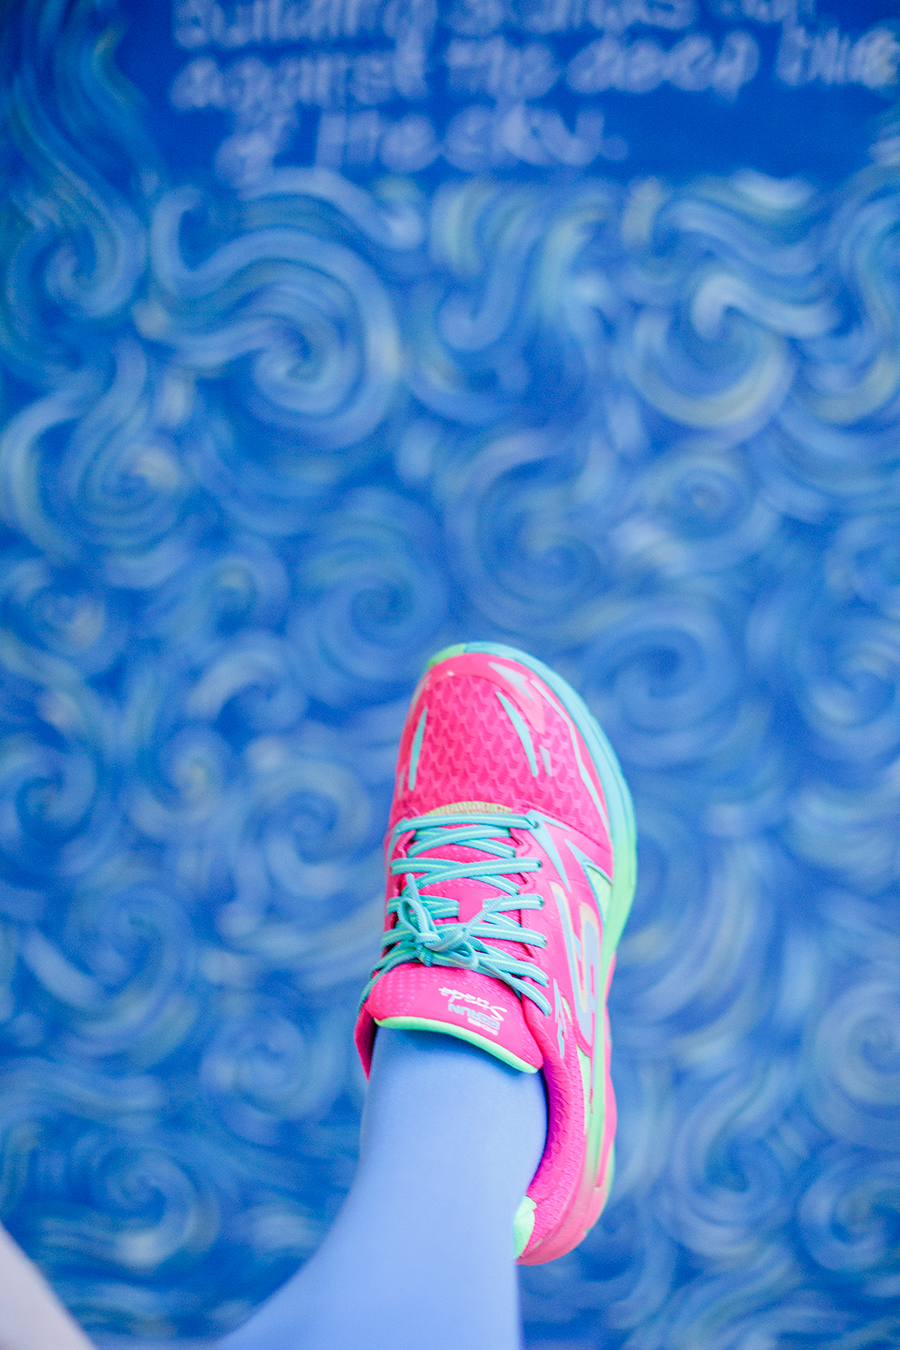 Void Deck Art Gallery: Homage to Vincent Van Gogh. Wearing Skechers neon pink sneakers.